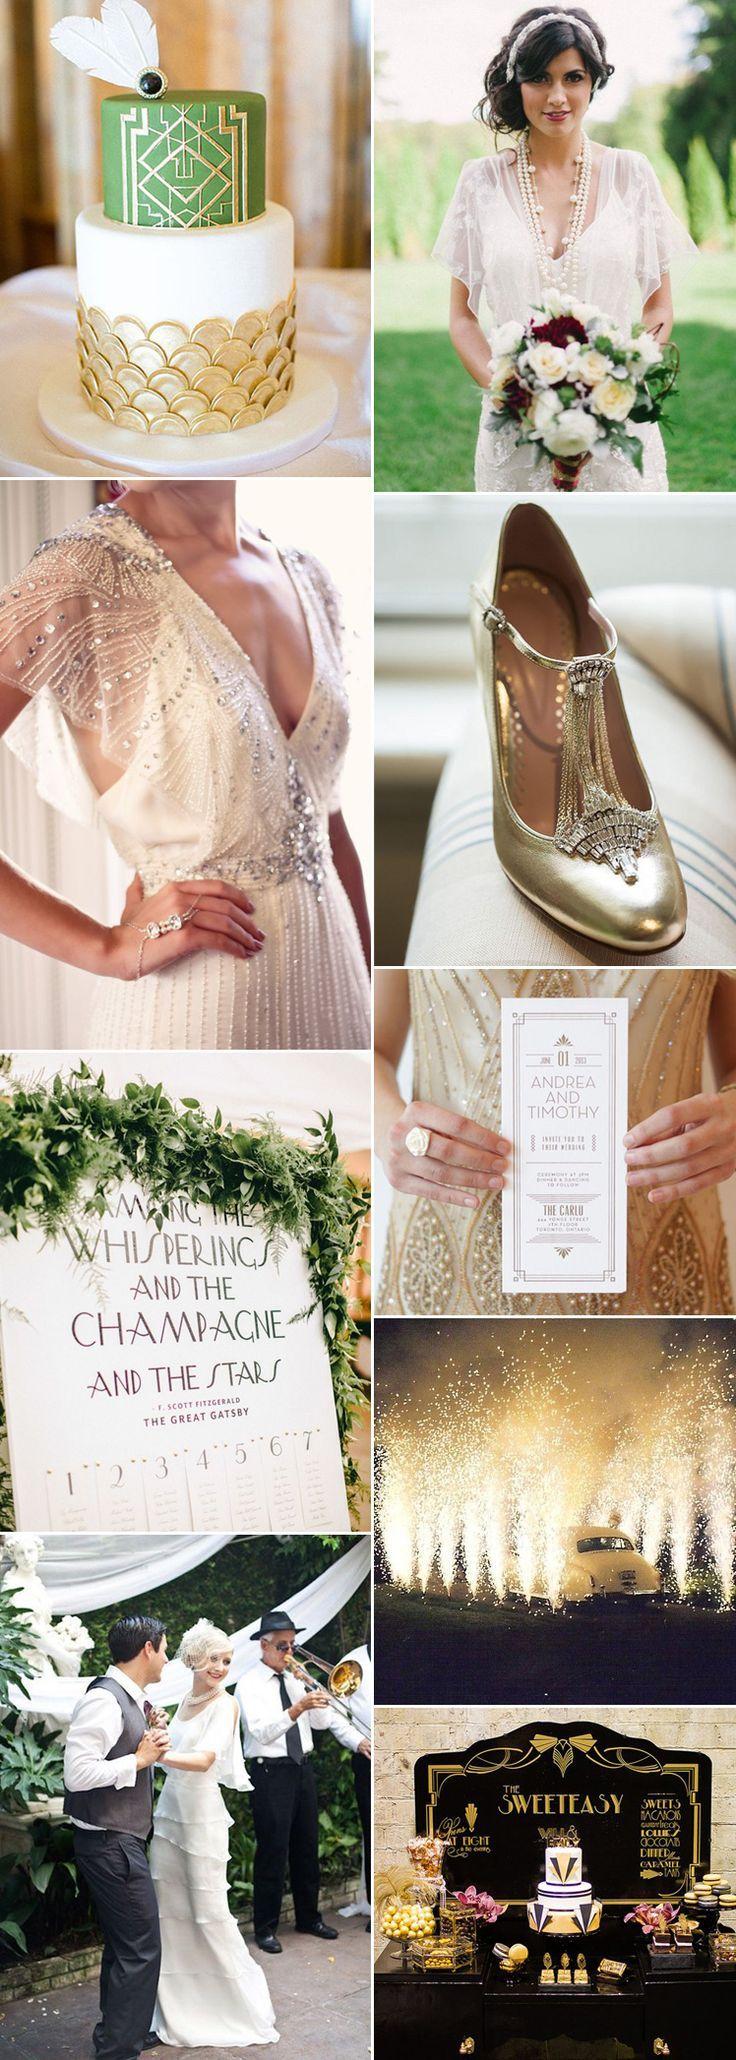 1920s wedding decoration ideas   best Art Deco Wedding images on Pinterest  Gatsby party s